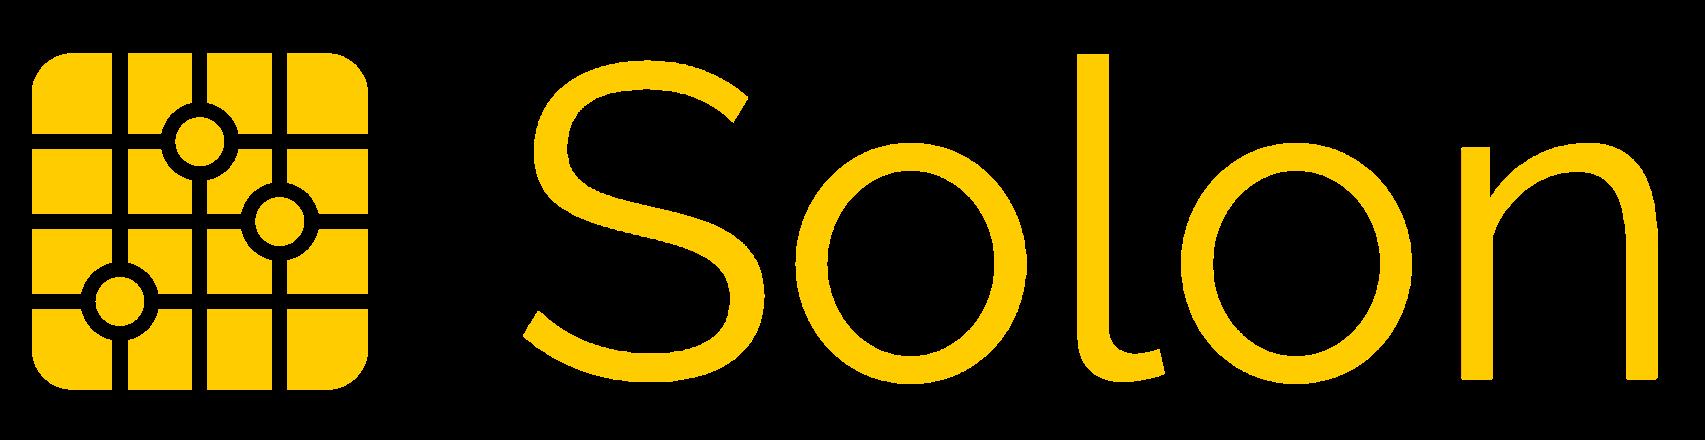 Solon-logo-web